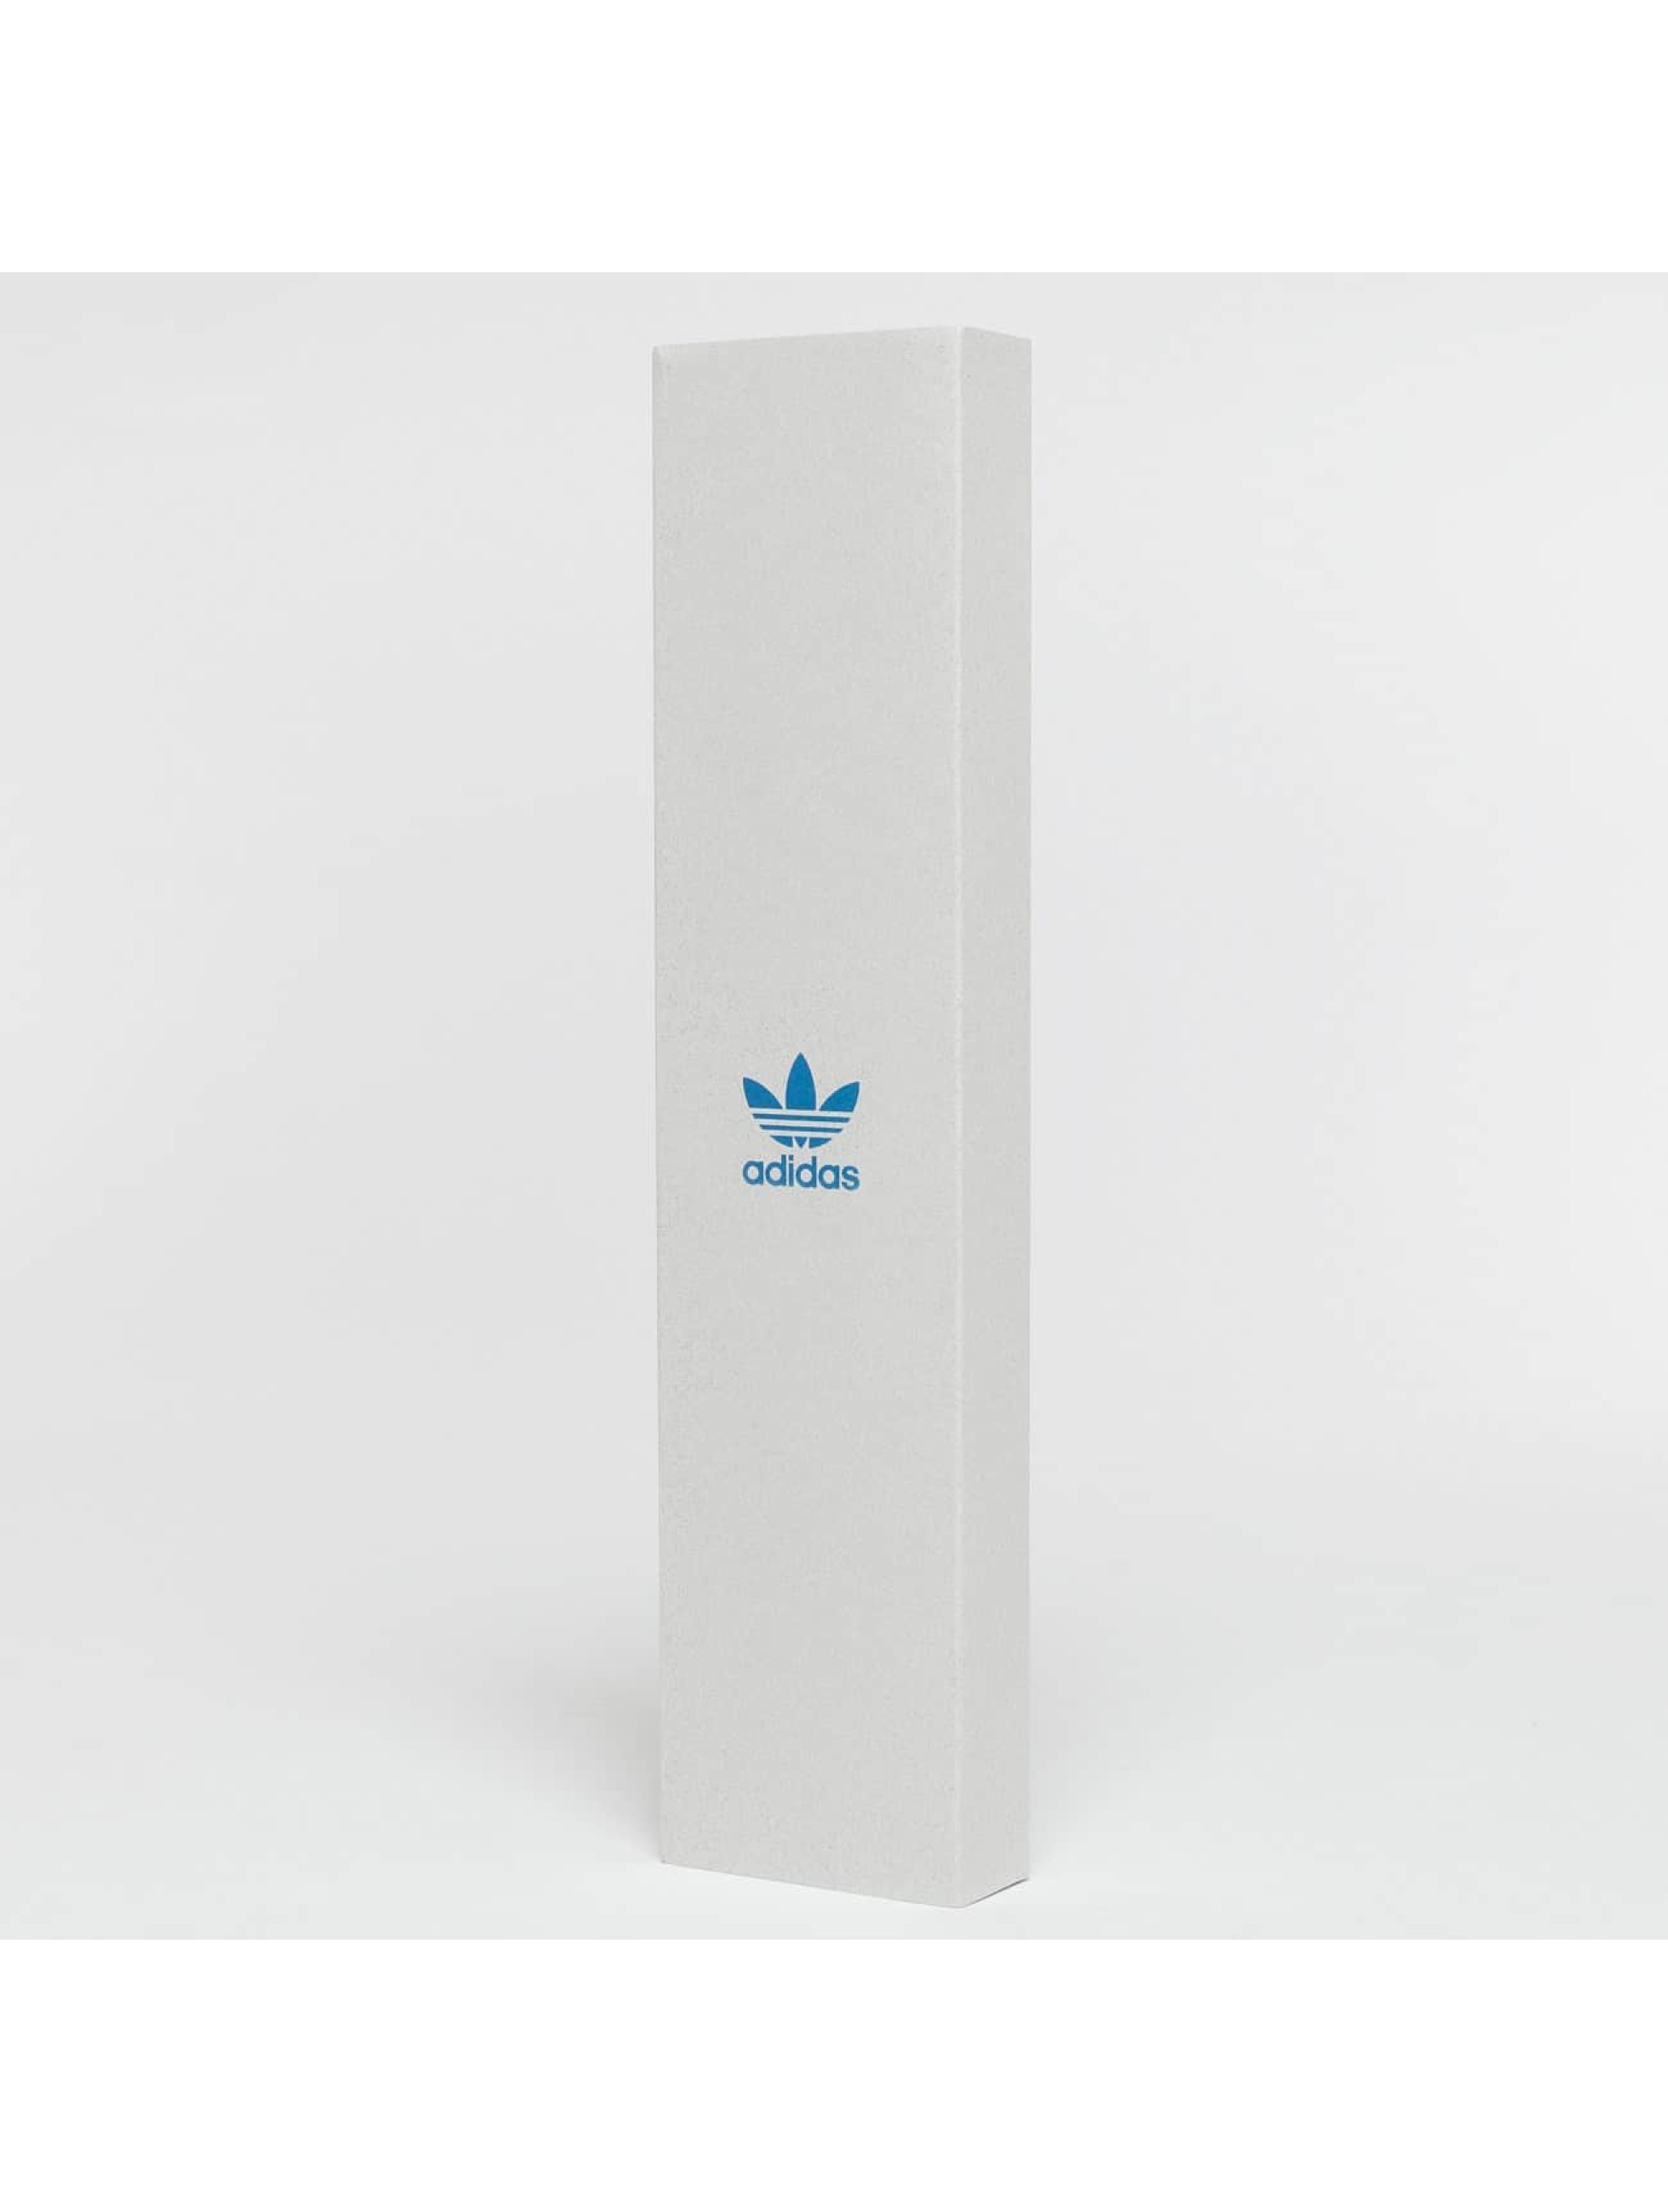 Adidas Watches Kellot District M1 kullanvärinen